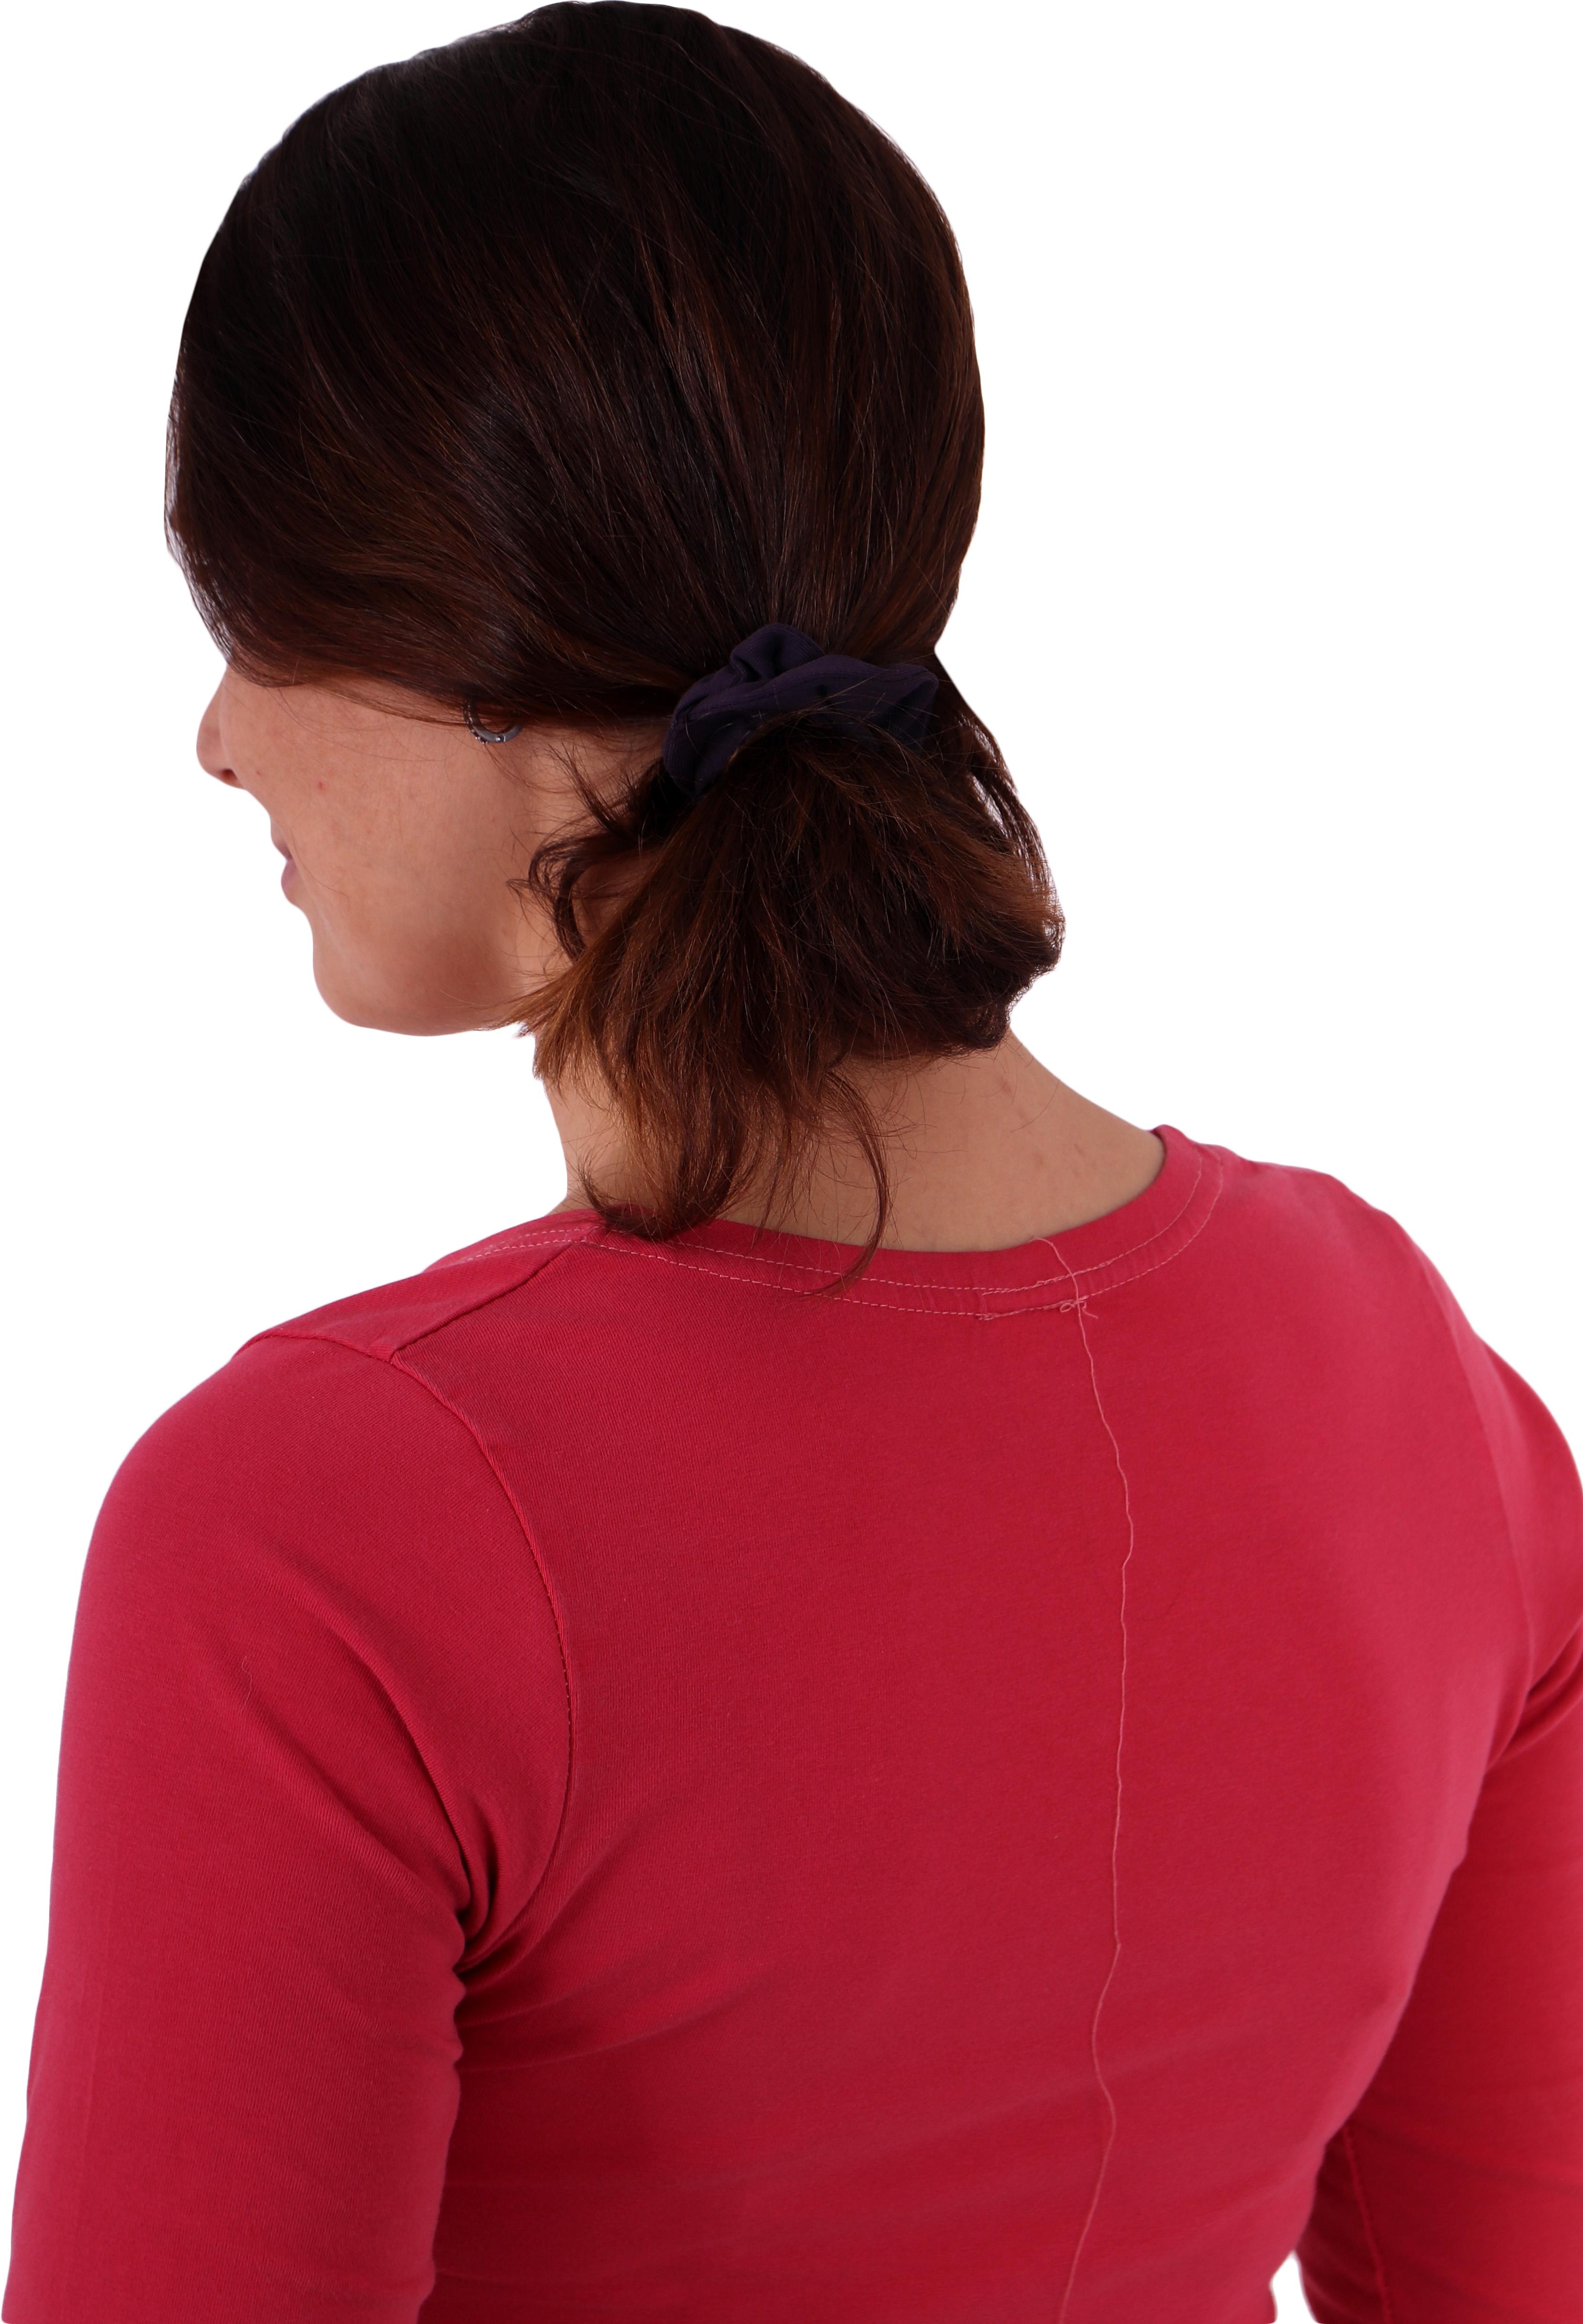 Látková gumička do vlasů, malá, švestkově fialová